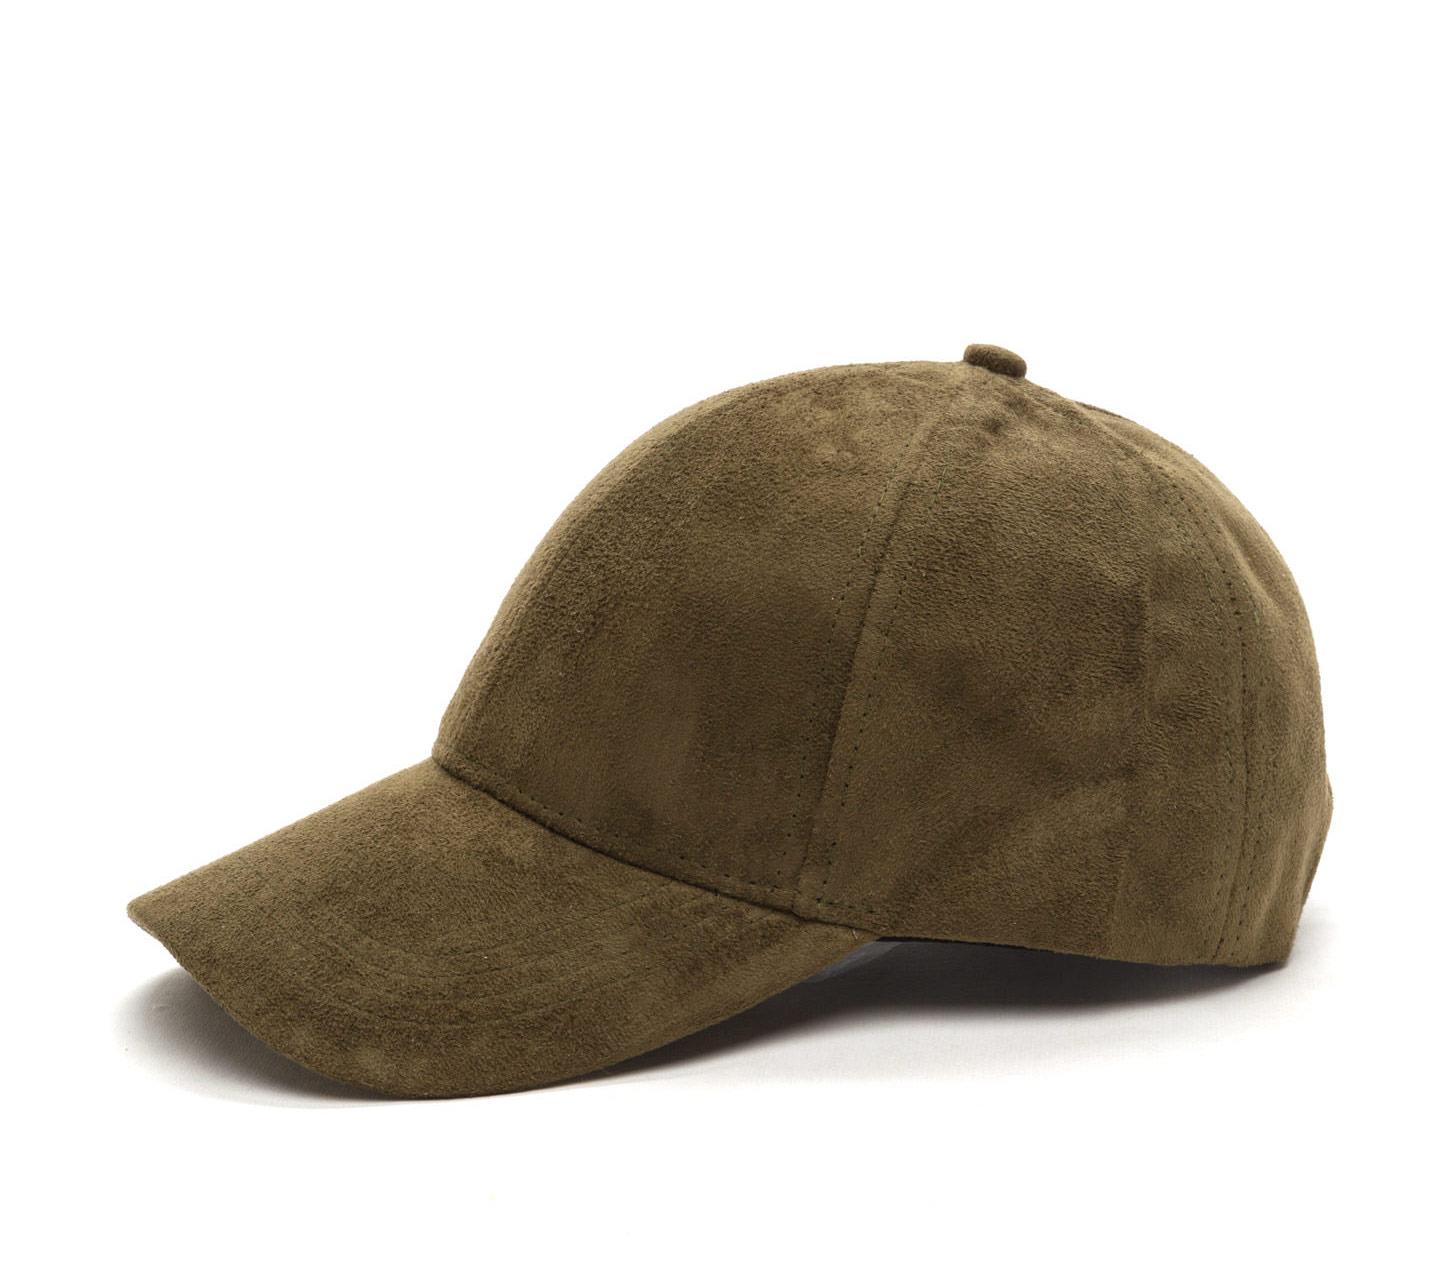 35d84ba8cd7 Olive Green Suede Baseball Cap on Storenvy